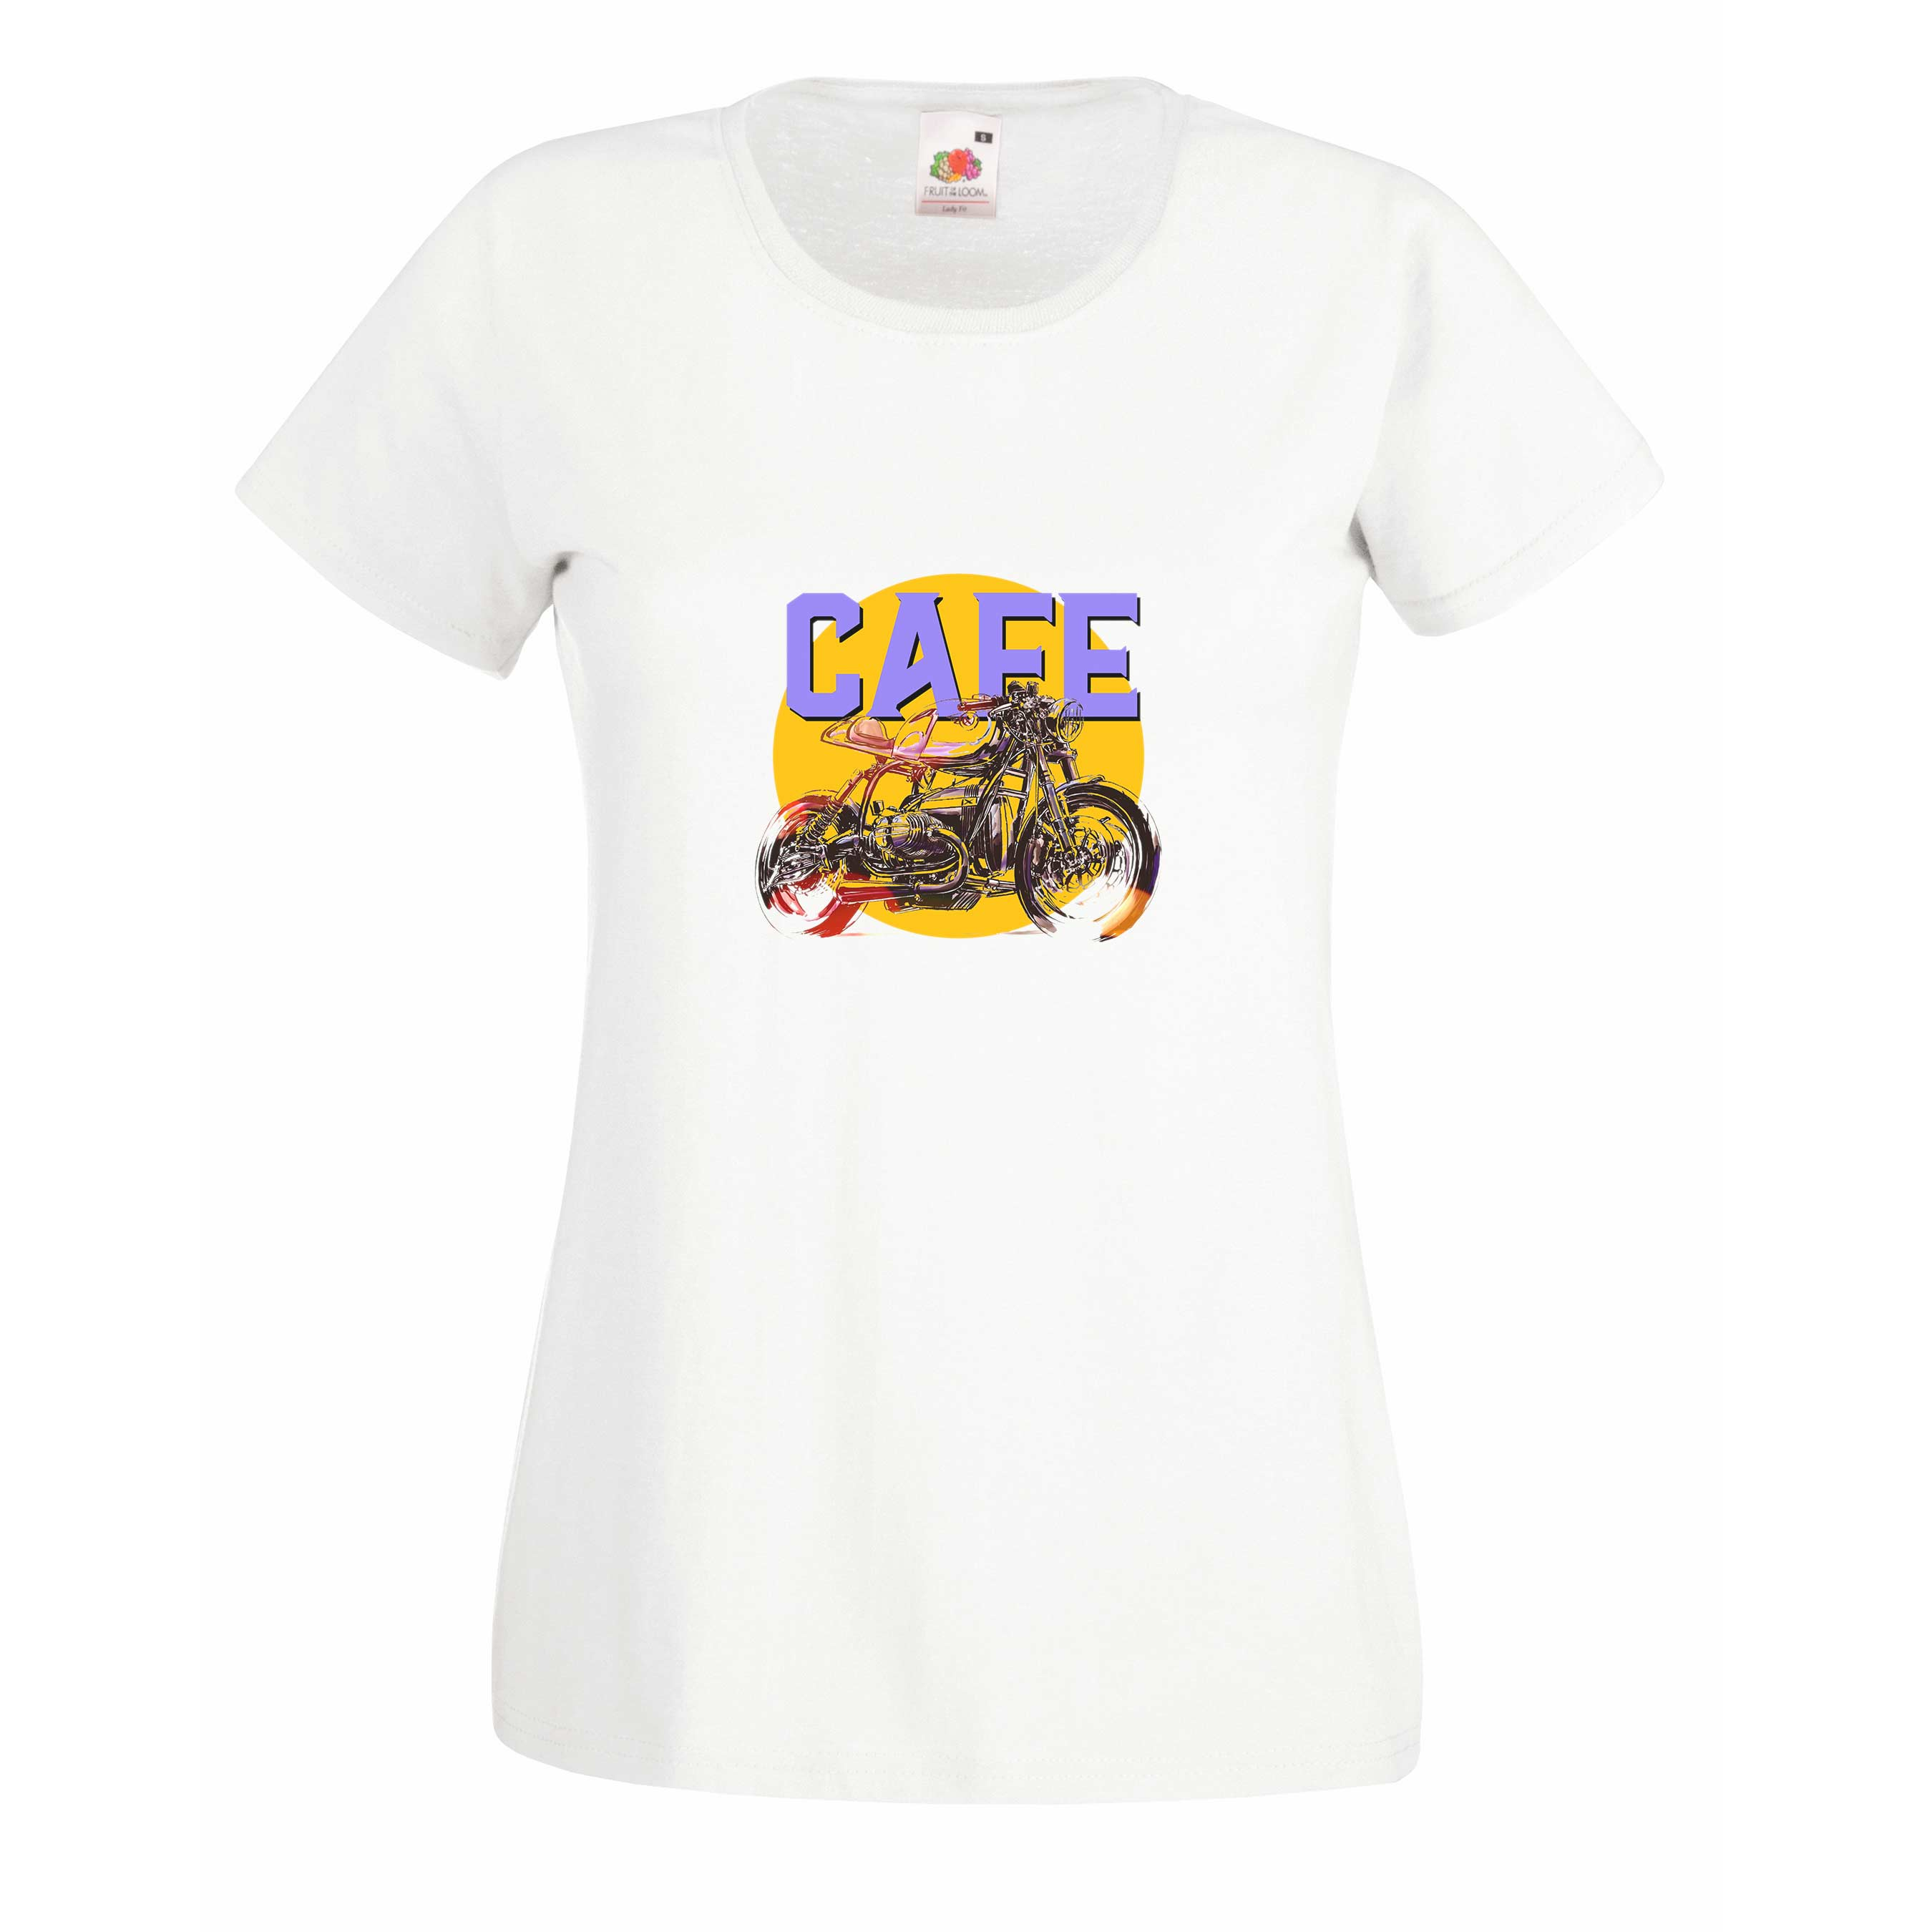 Cafe racer design for t-shirt, hoodie & sweatshirt